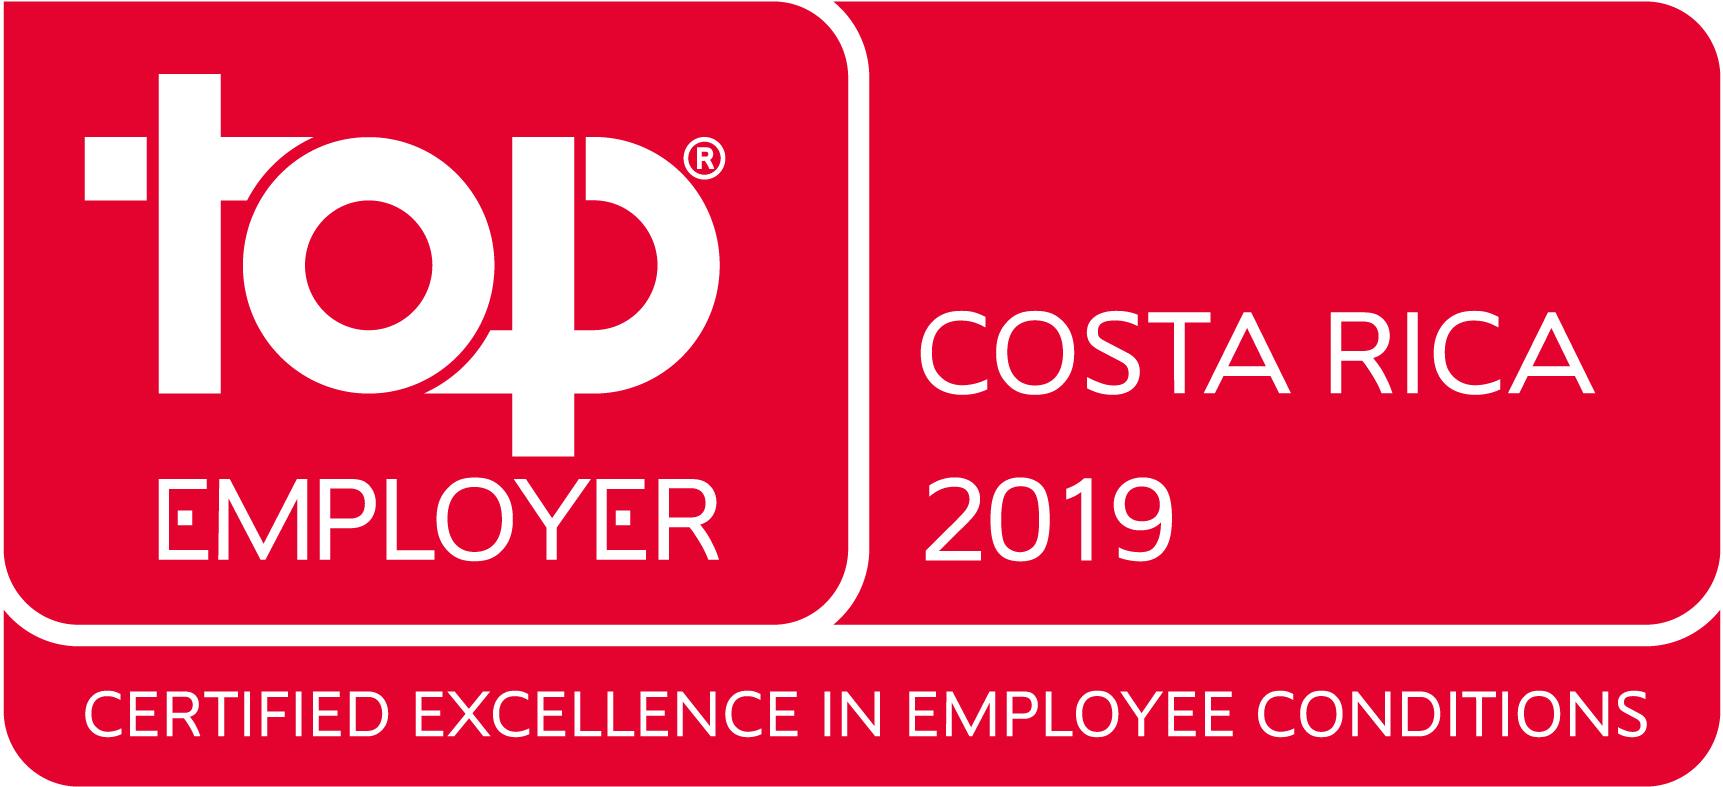 Top_Employer_Costa_Rica_2019